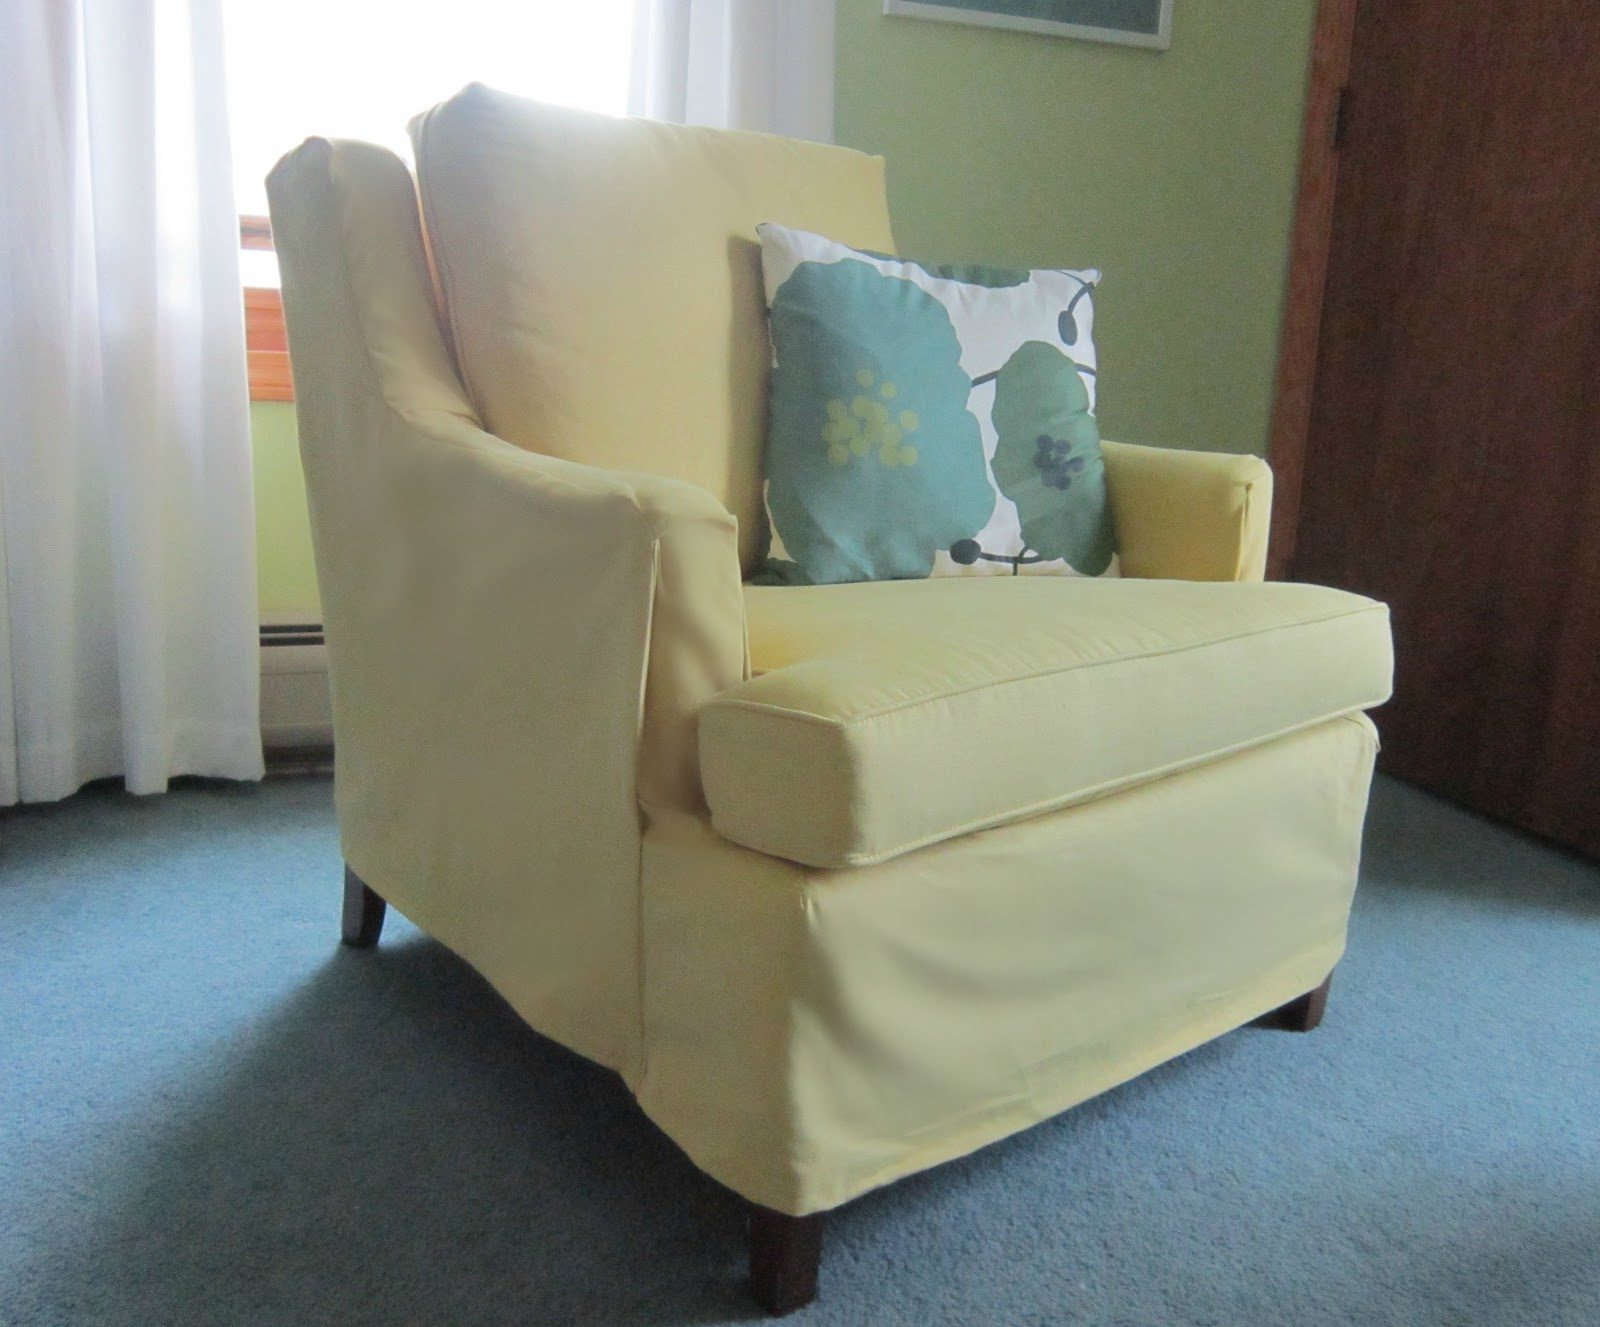 yellow chair covers massage brookstone design megillah slipcovering a